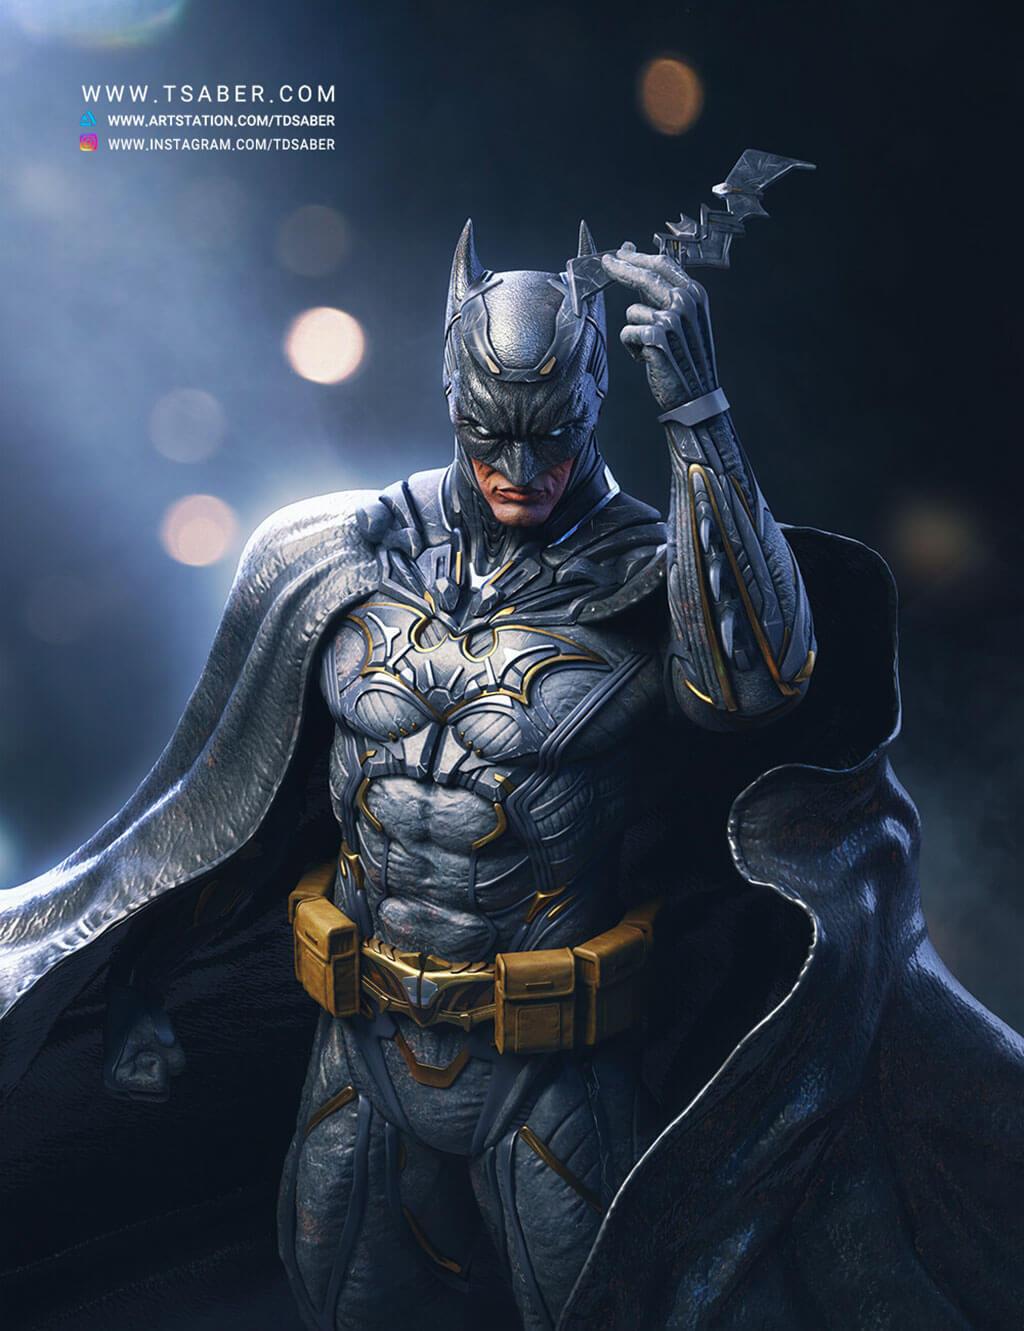 Batman Fan Art by Taregh Saber